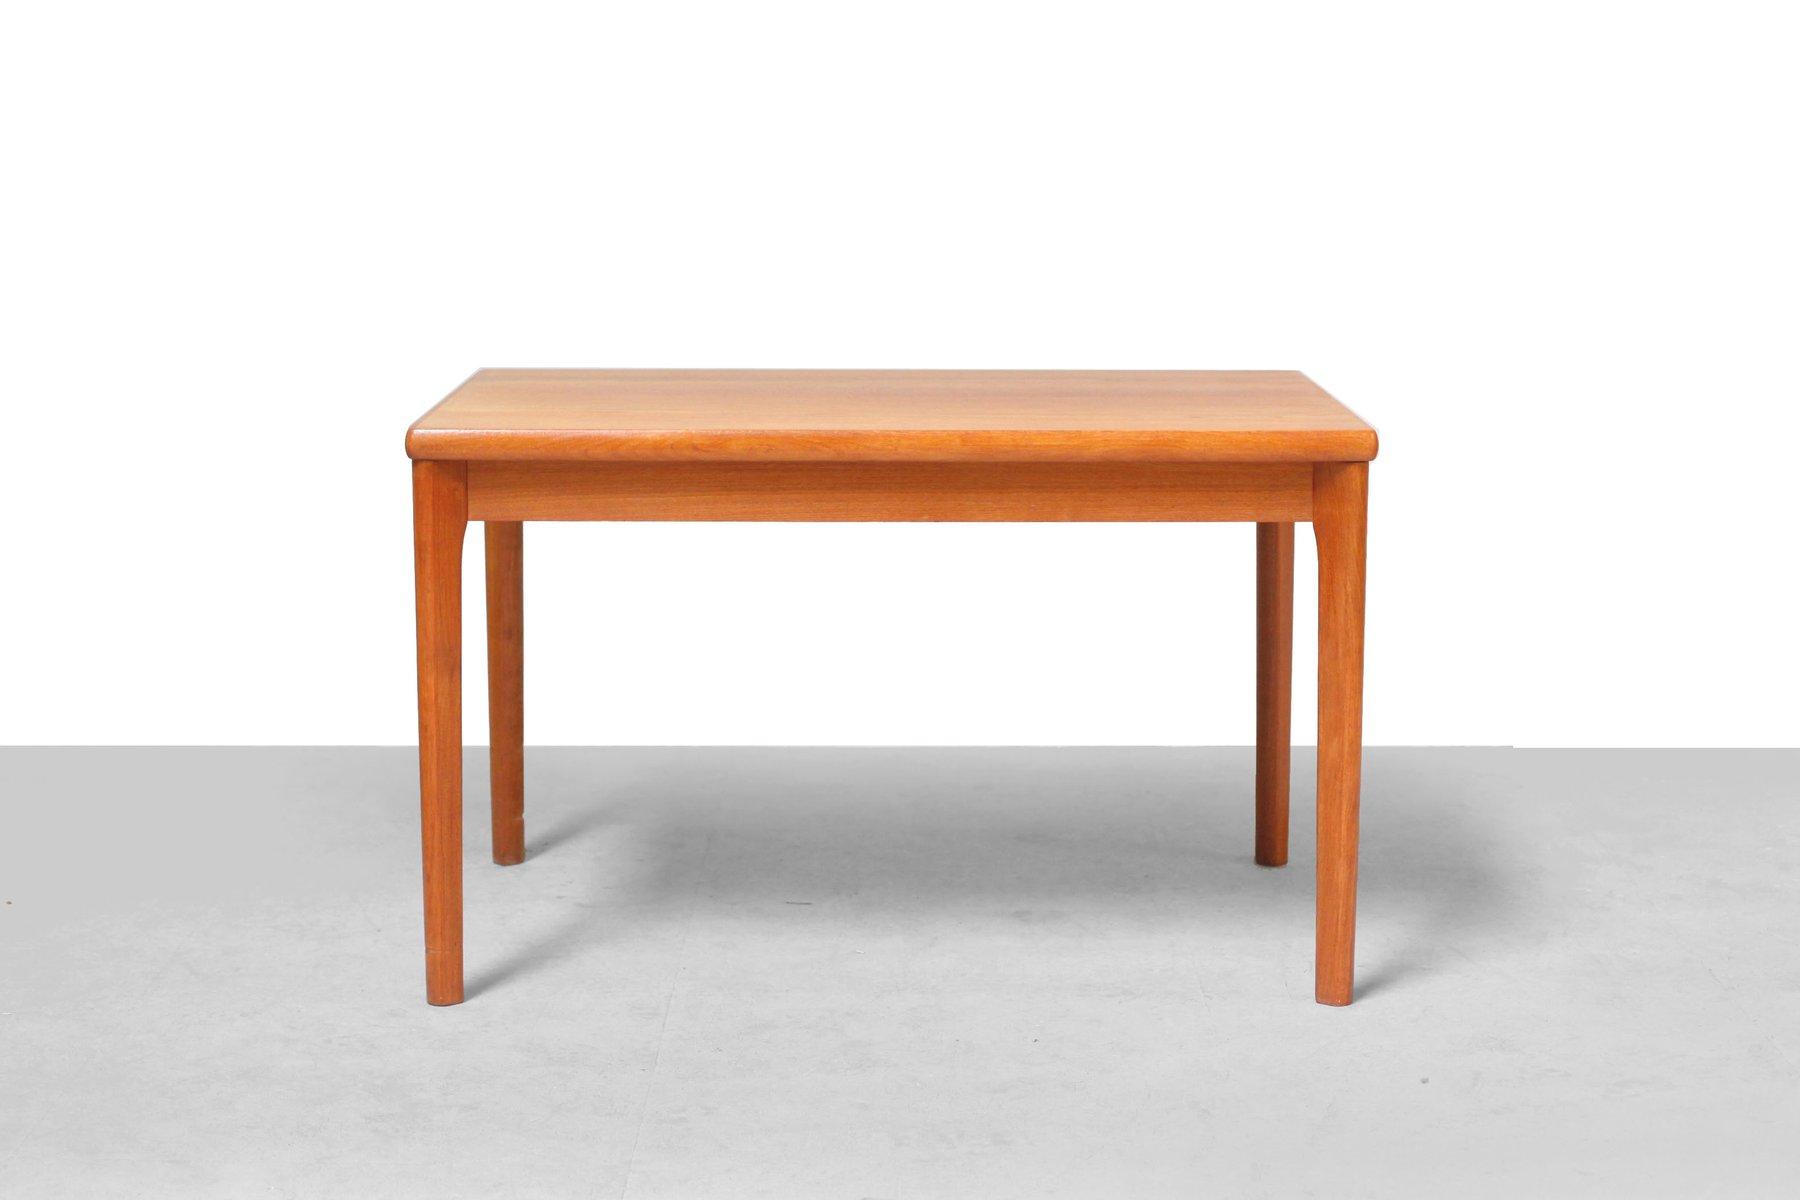 Danish Modern Dining Table Danish Modern Teak Dining Table 1960s For Sale At Pamono